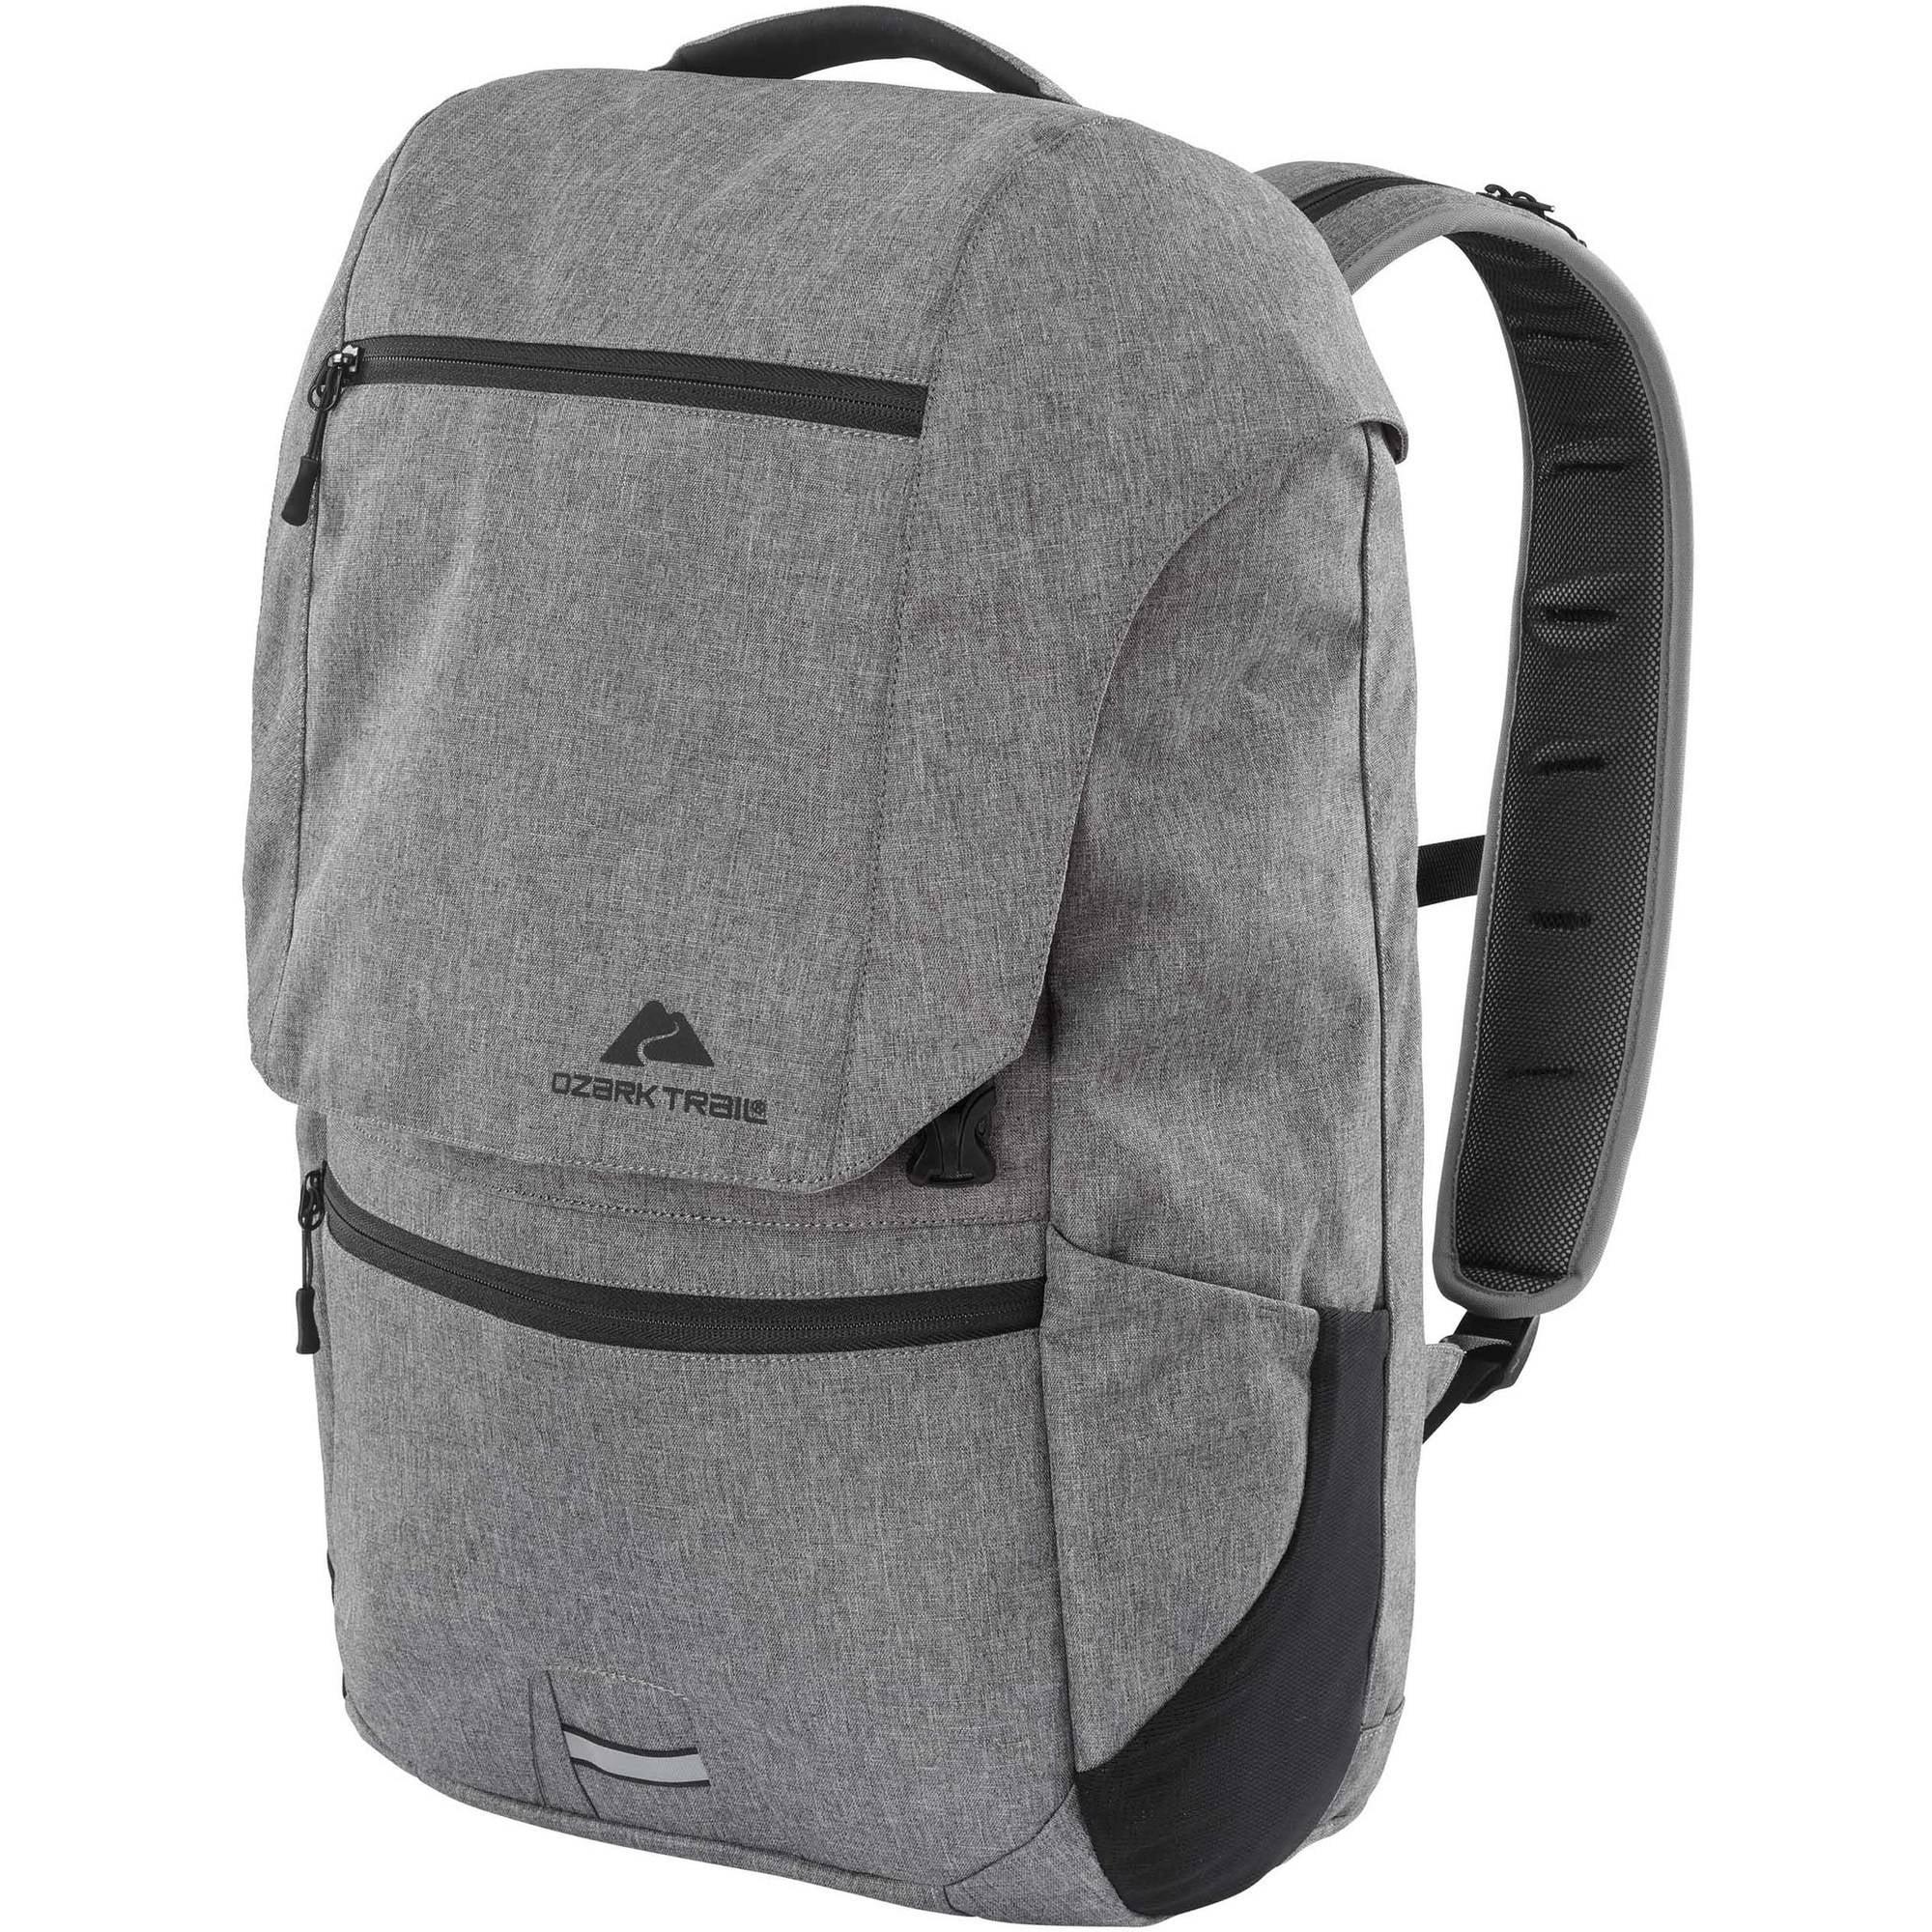 Ozark Trail Denali Outdoor Backpack